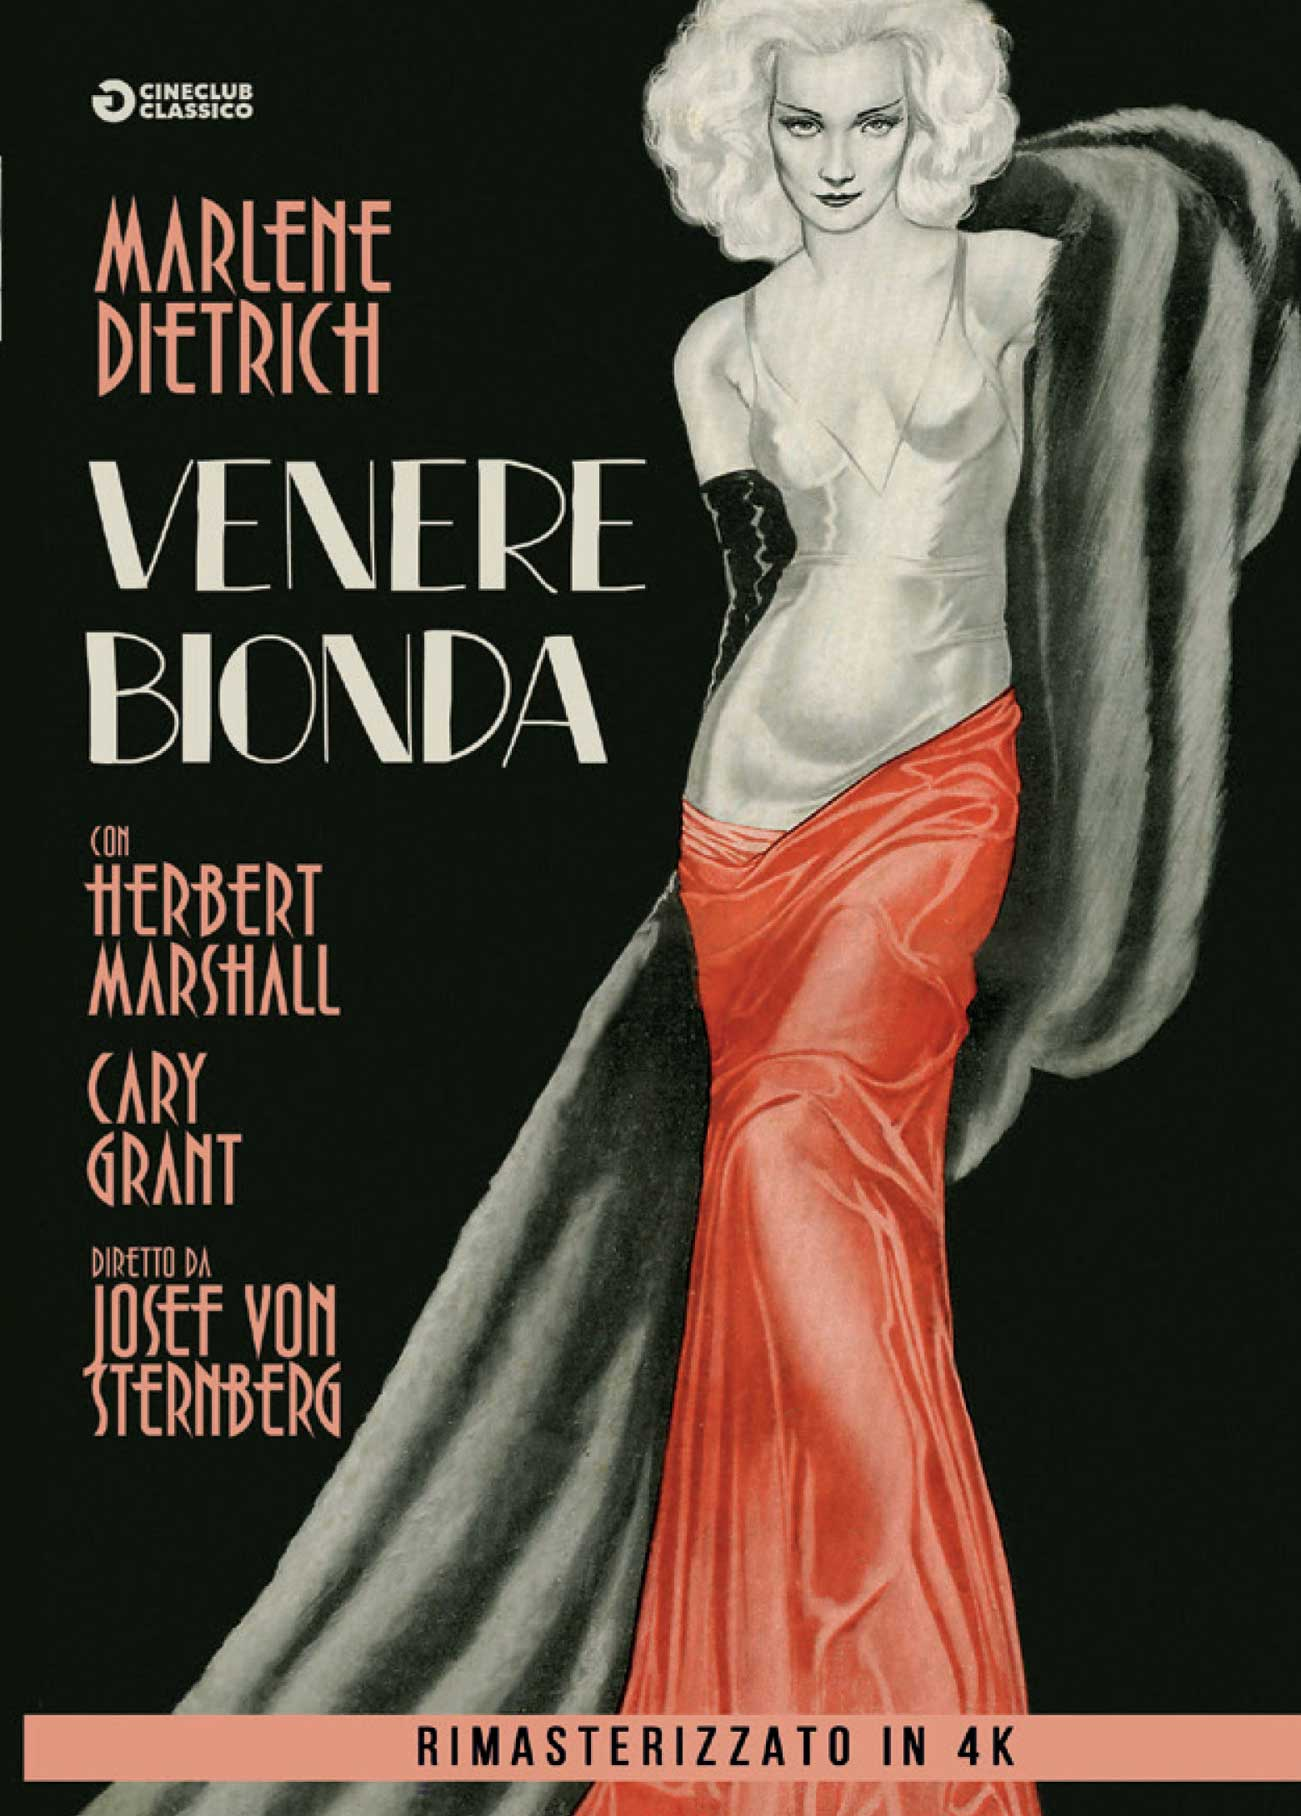 VENERE BIONDA (RIMASTERIZZATO IN 4K) (DVD)